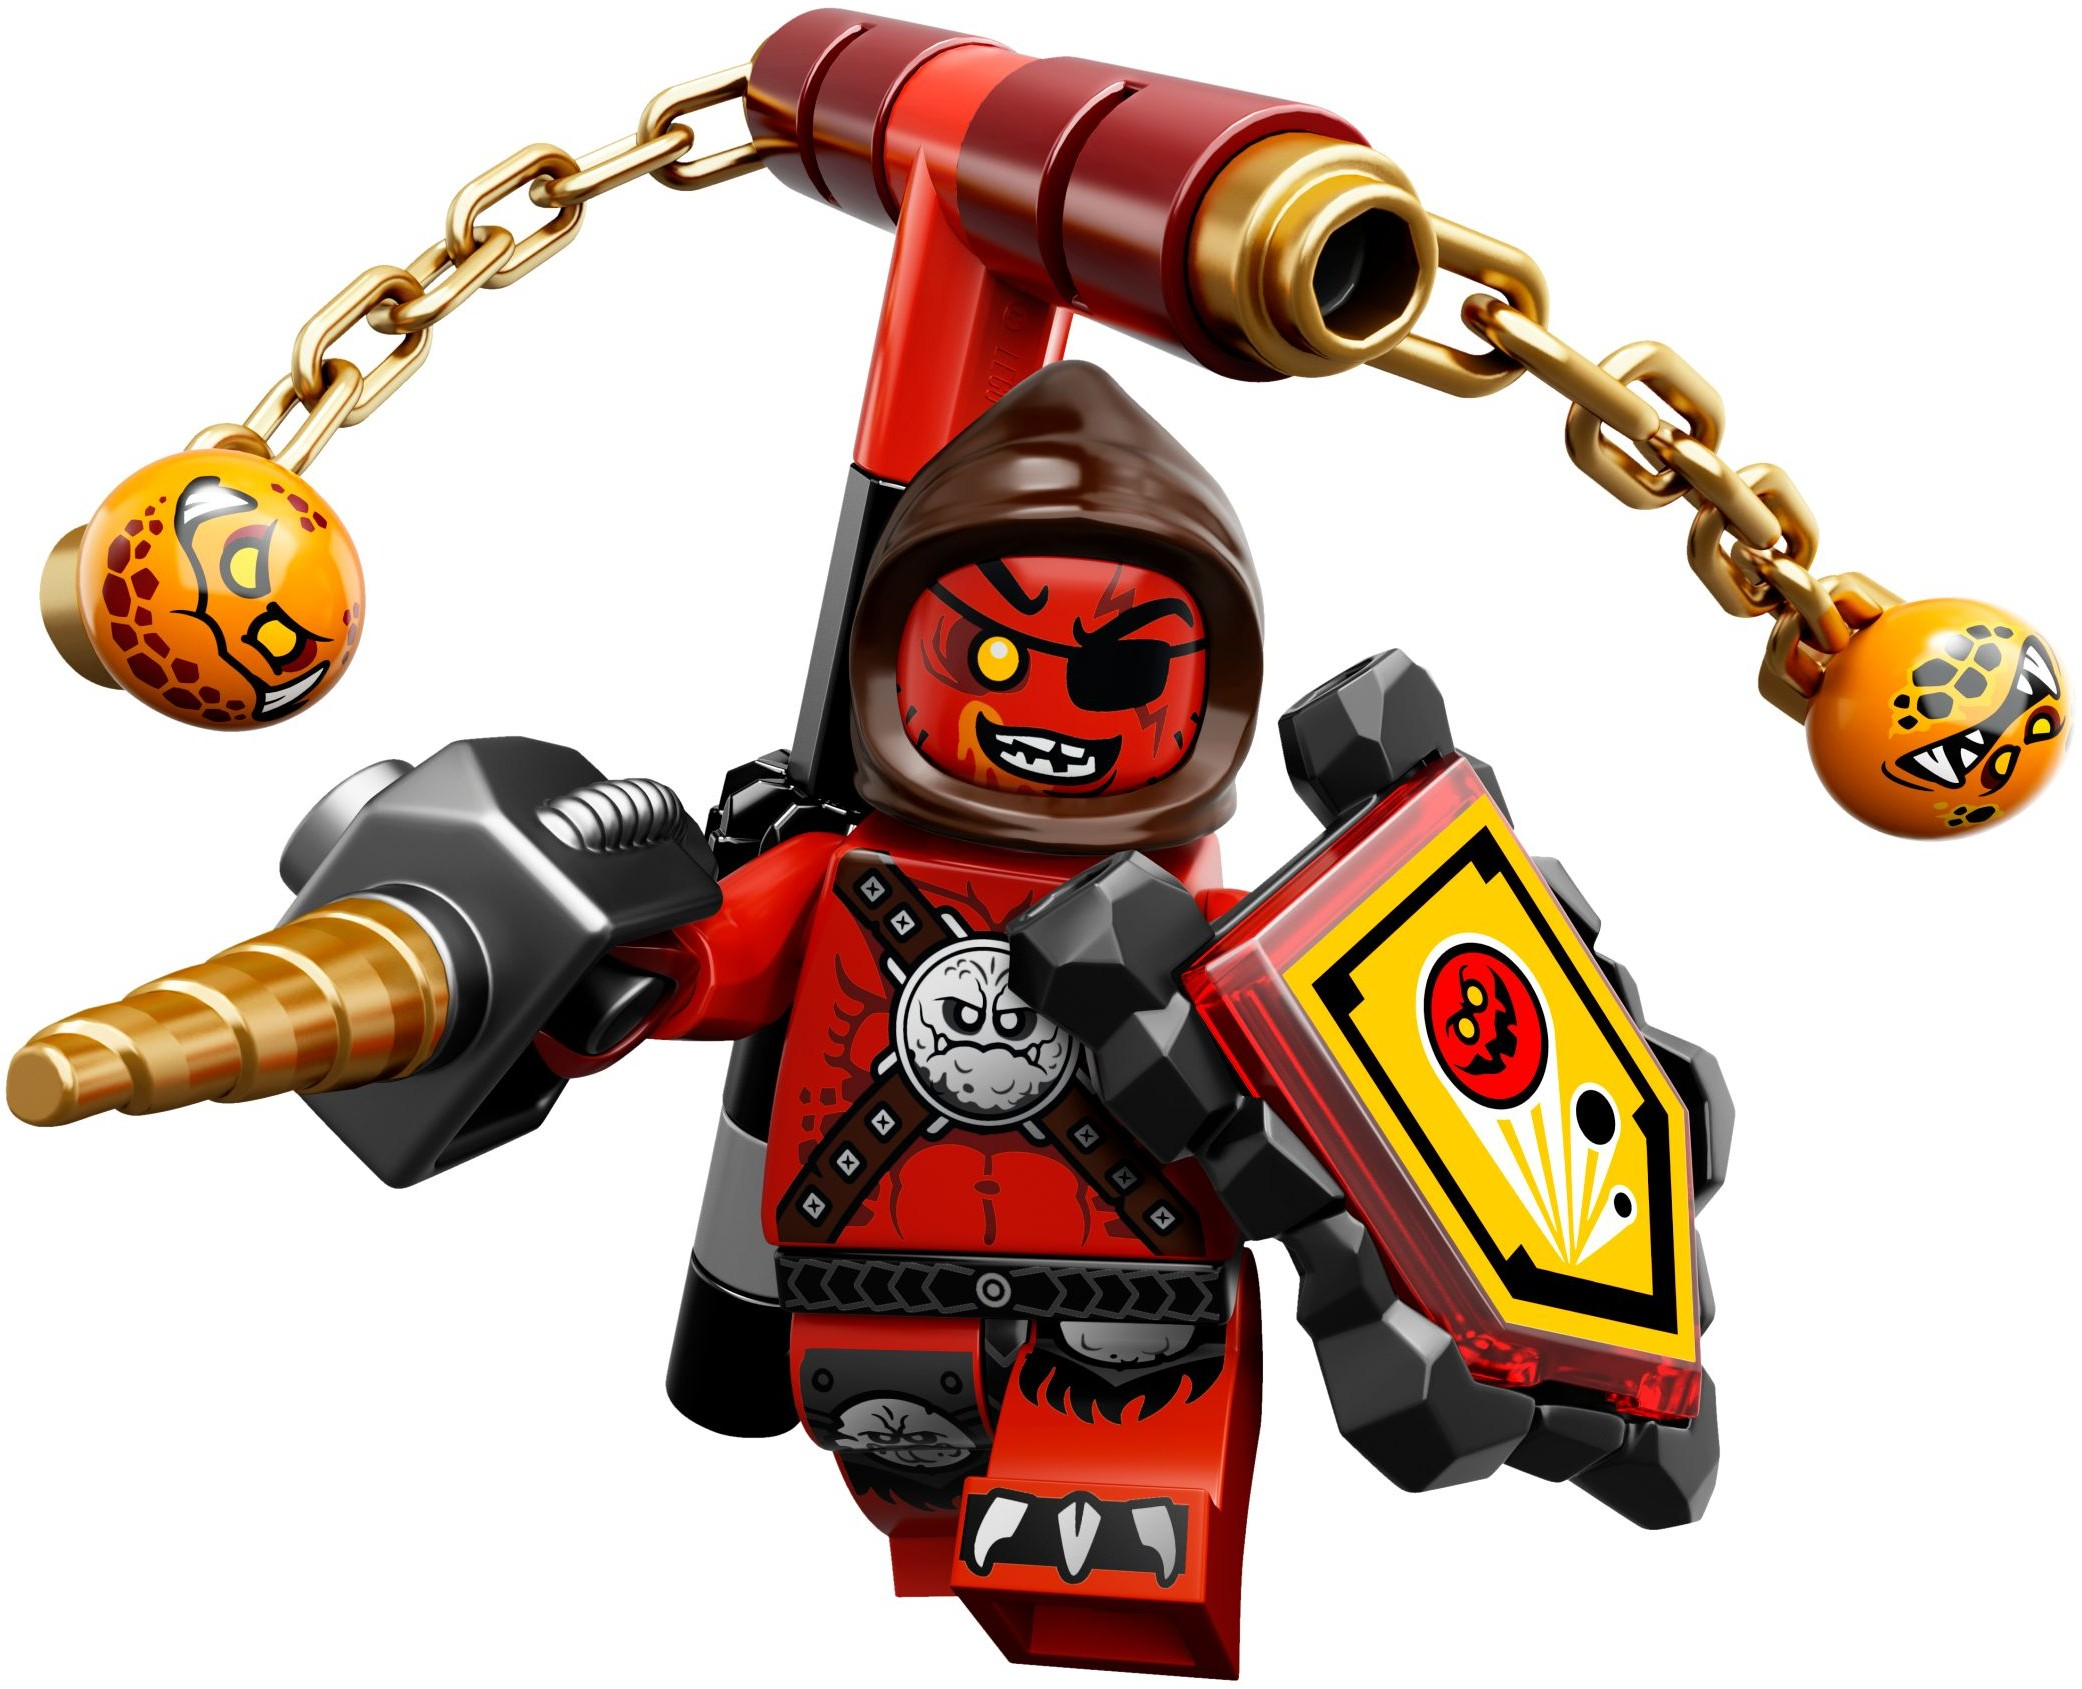 Lego 70334 Ultimate Beast Master